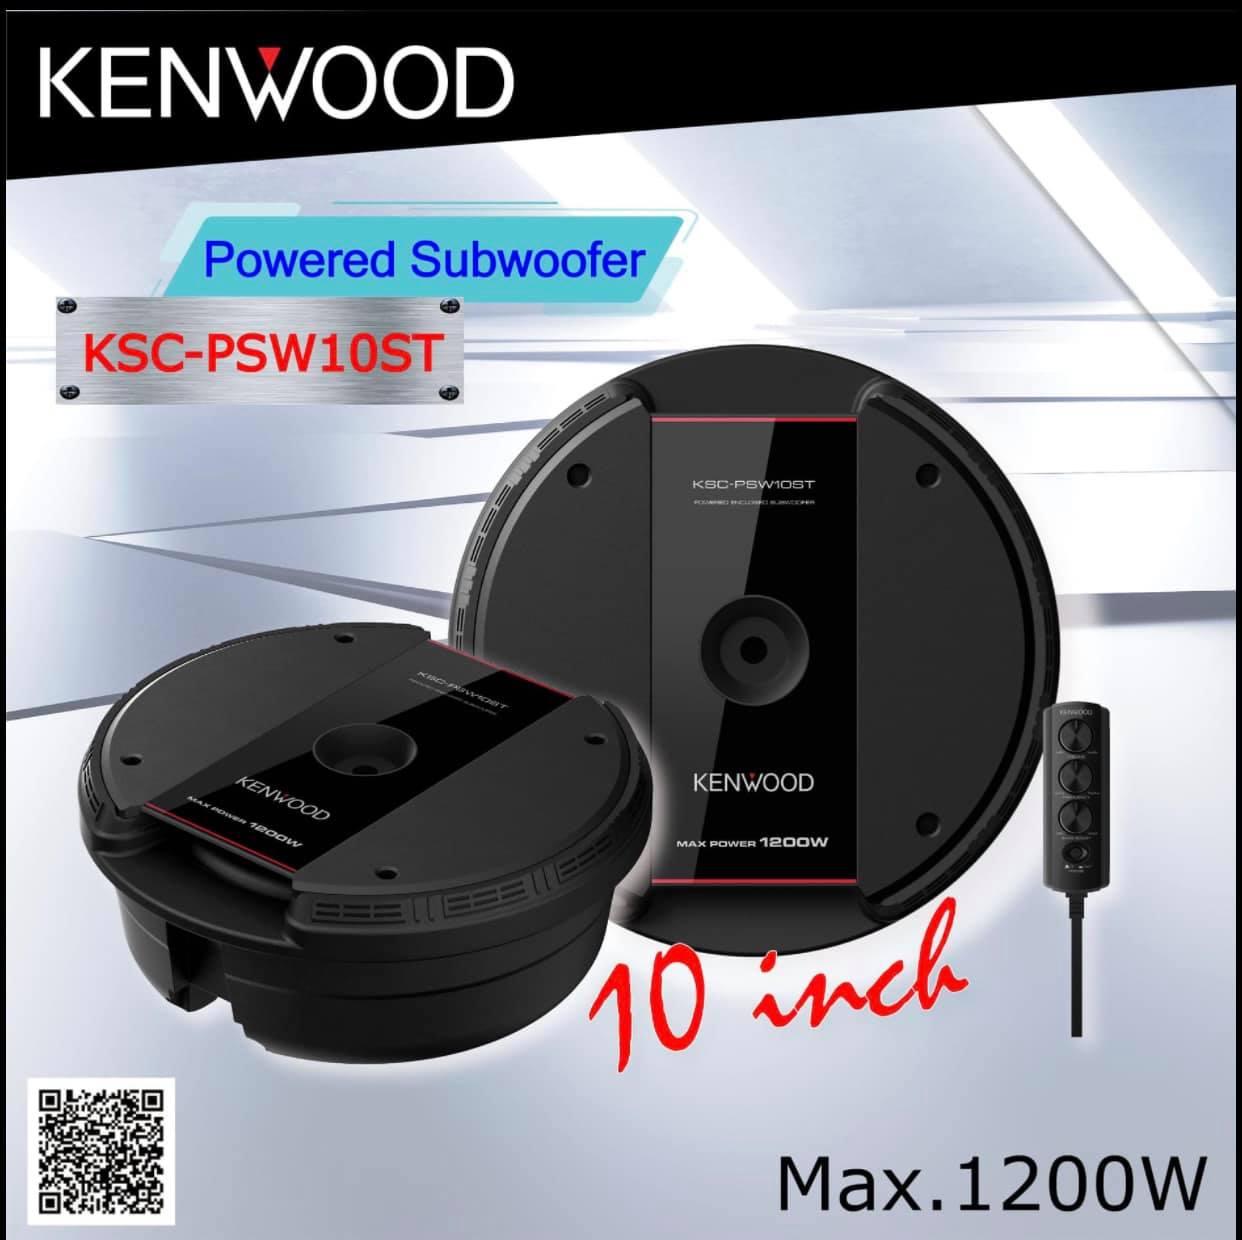 Kenwood KFC-PSW 10 ST